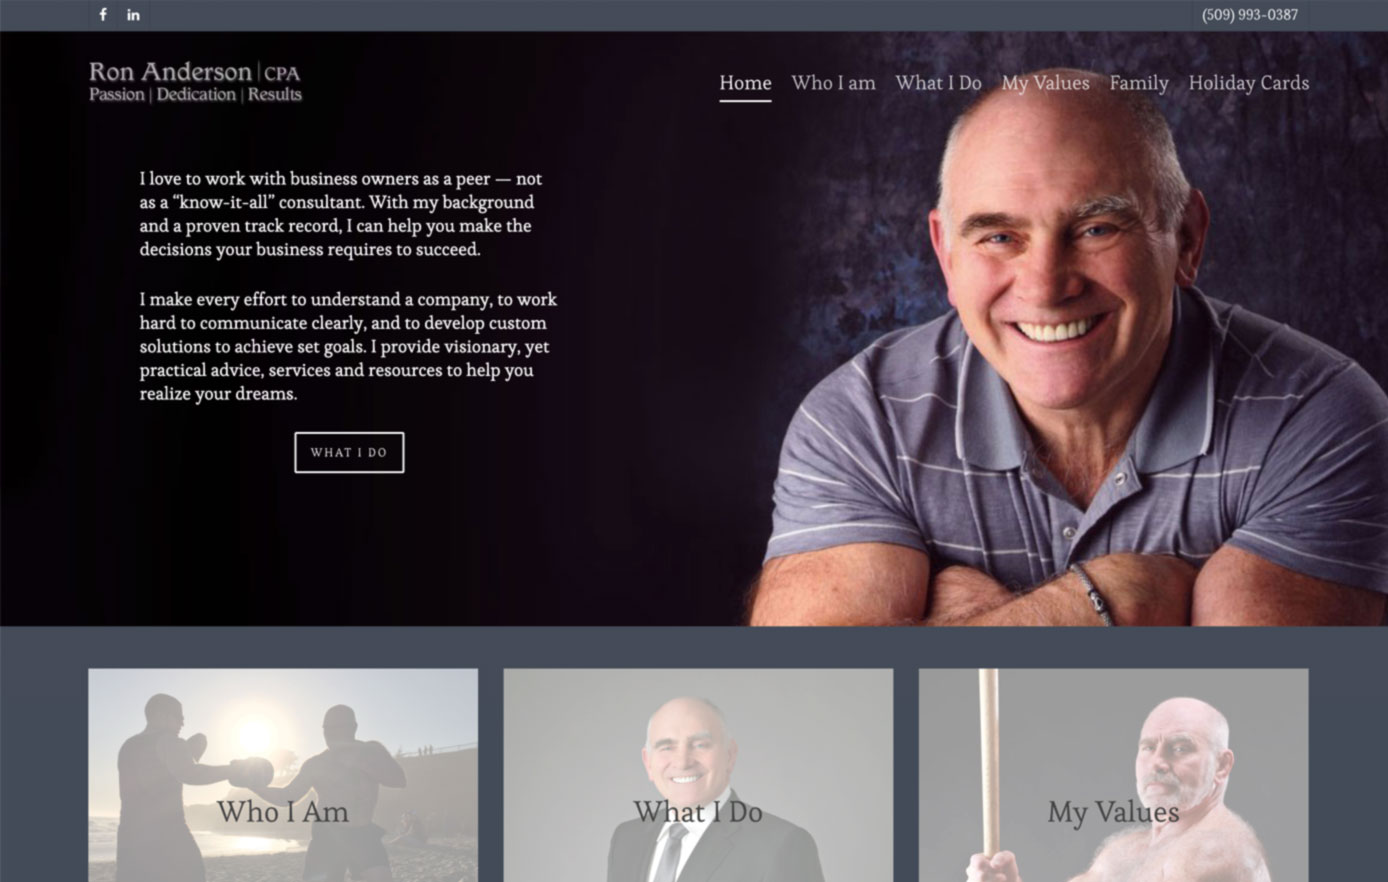 ron anderson cpa, website security, website design